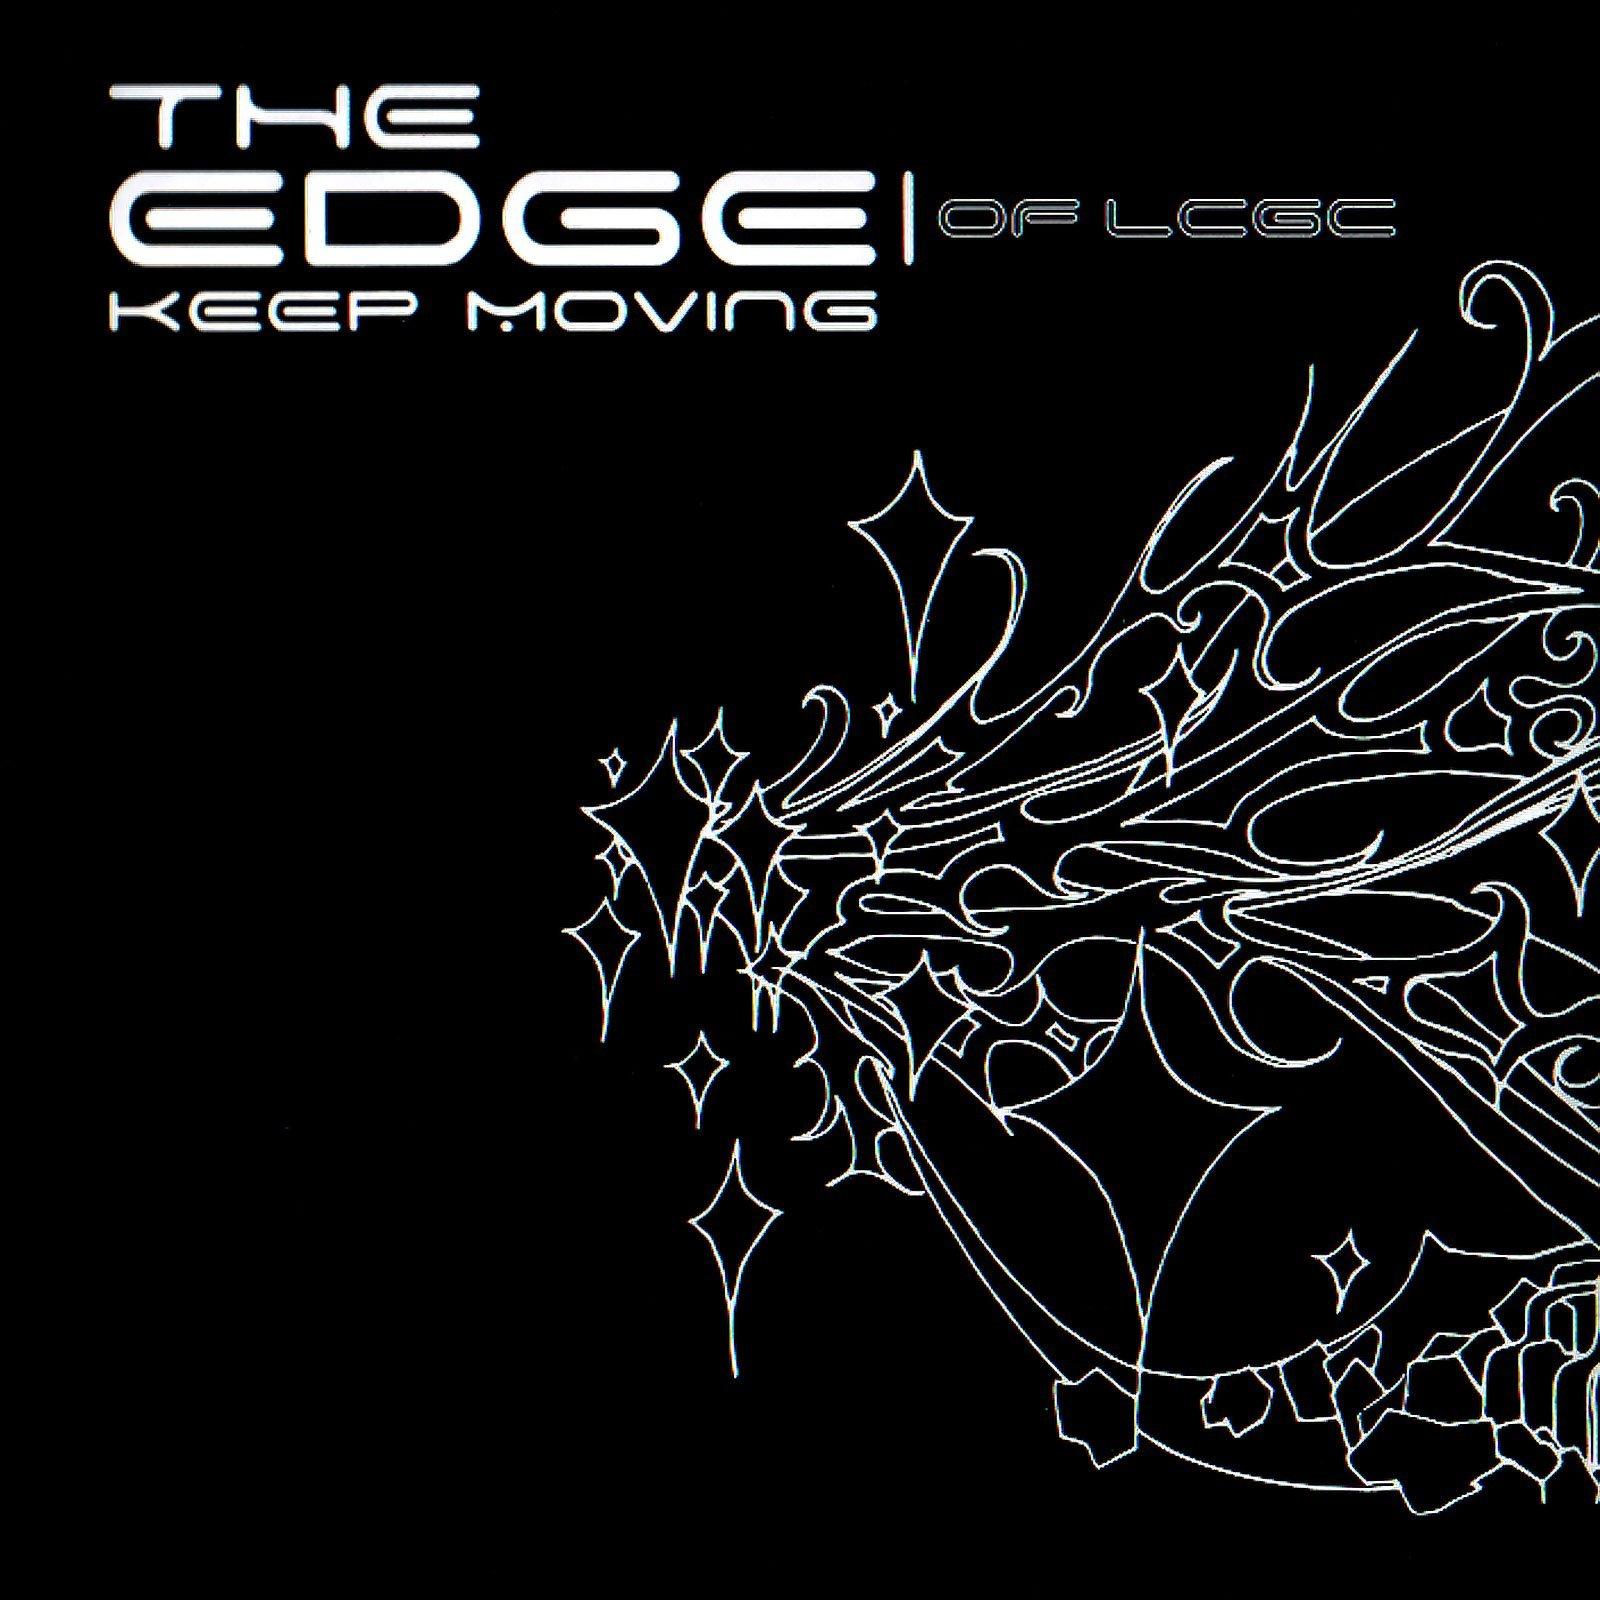 LCGC_The_Edge_Of_LCGC_Cover_1600x1600